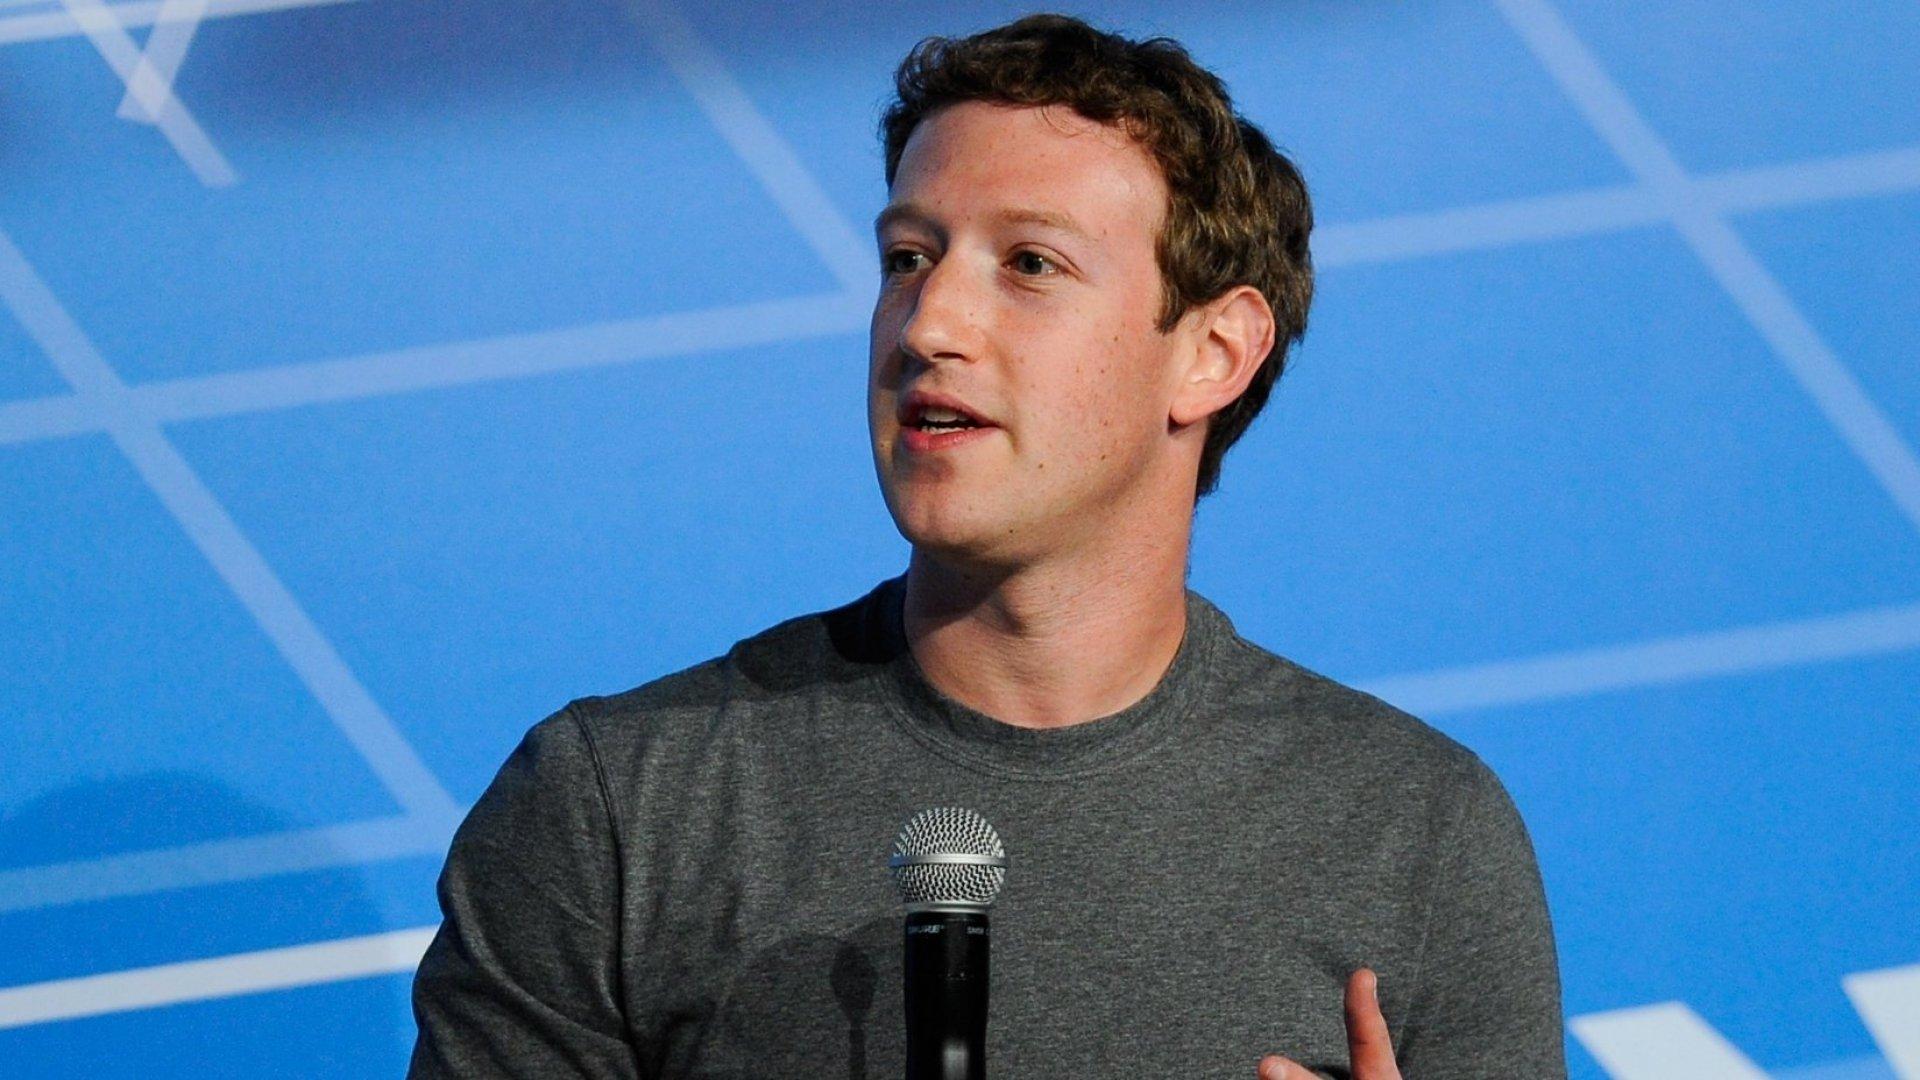 Facebook Reports $7 Billion Revenue, Beats Market Estimates